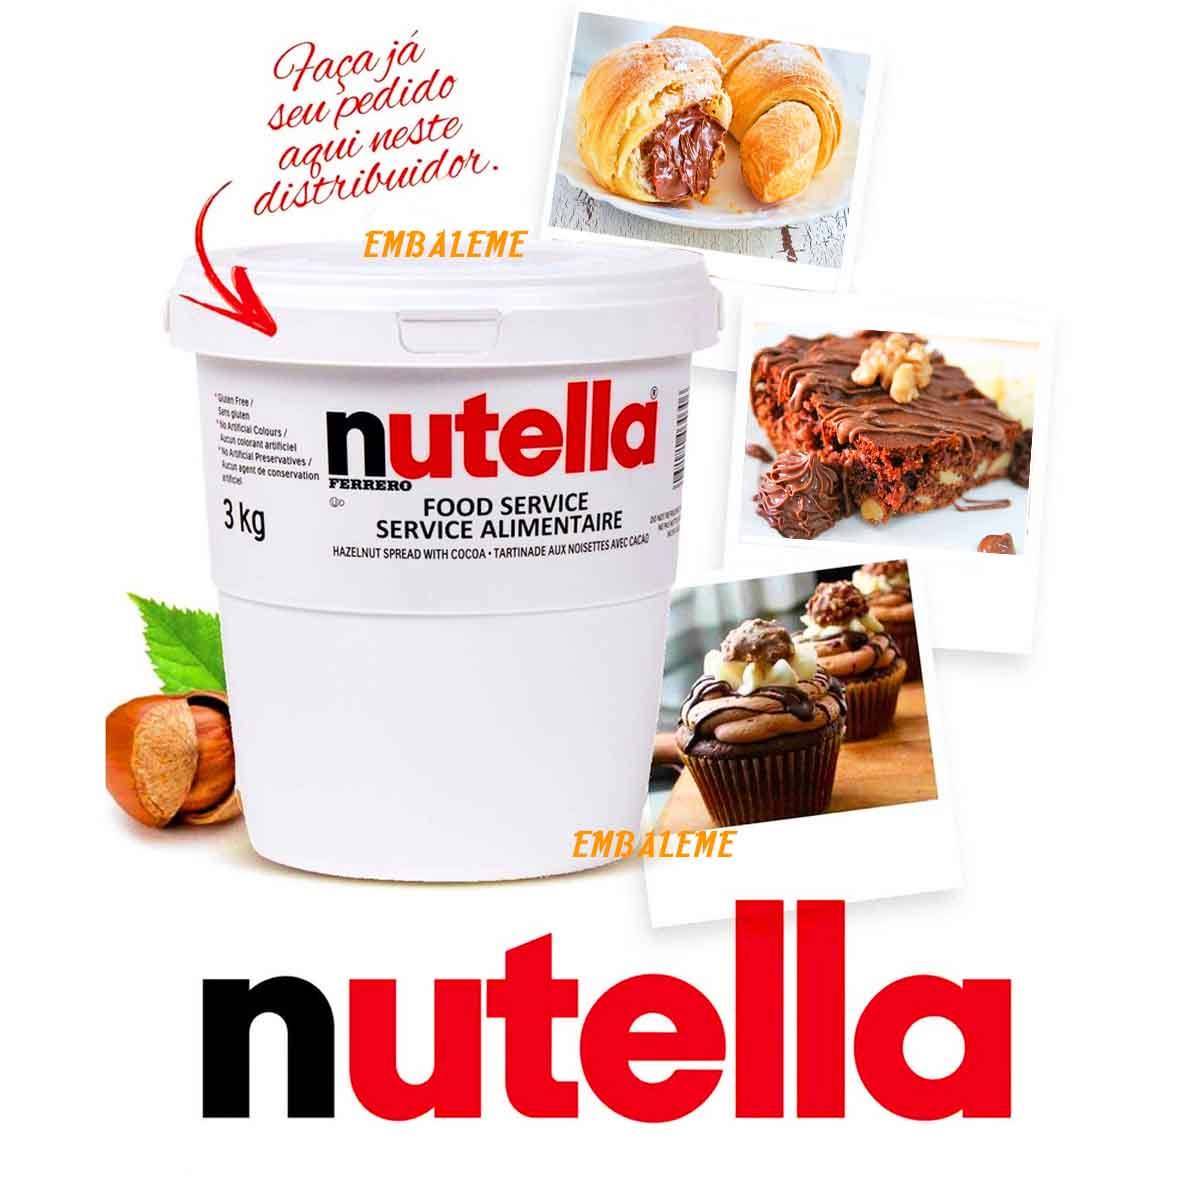 Nutella 3kg Ferrero Creme de Avelã com Cacau